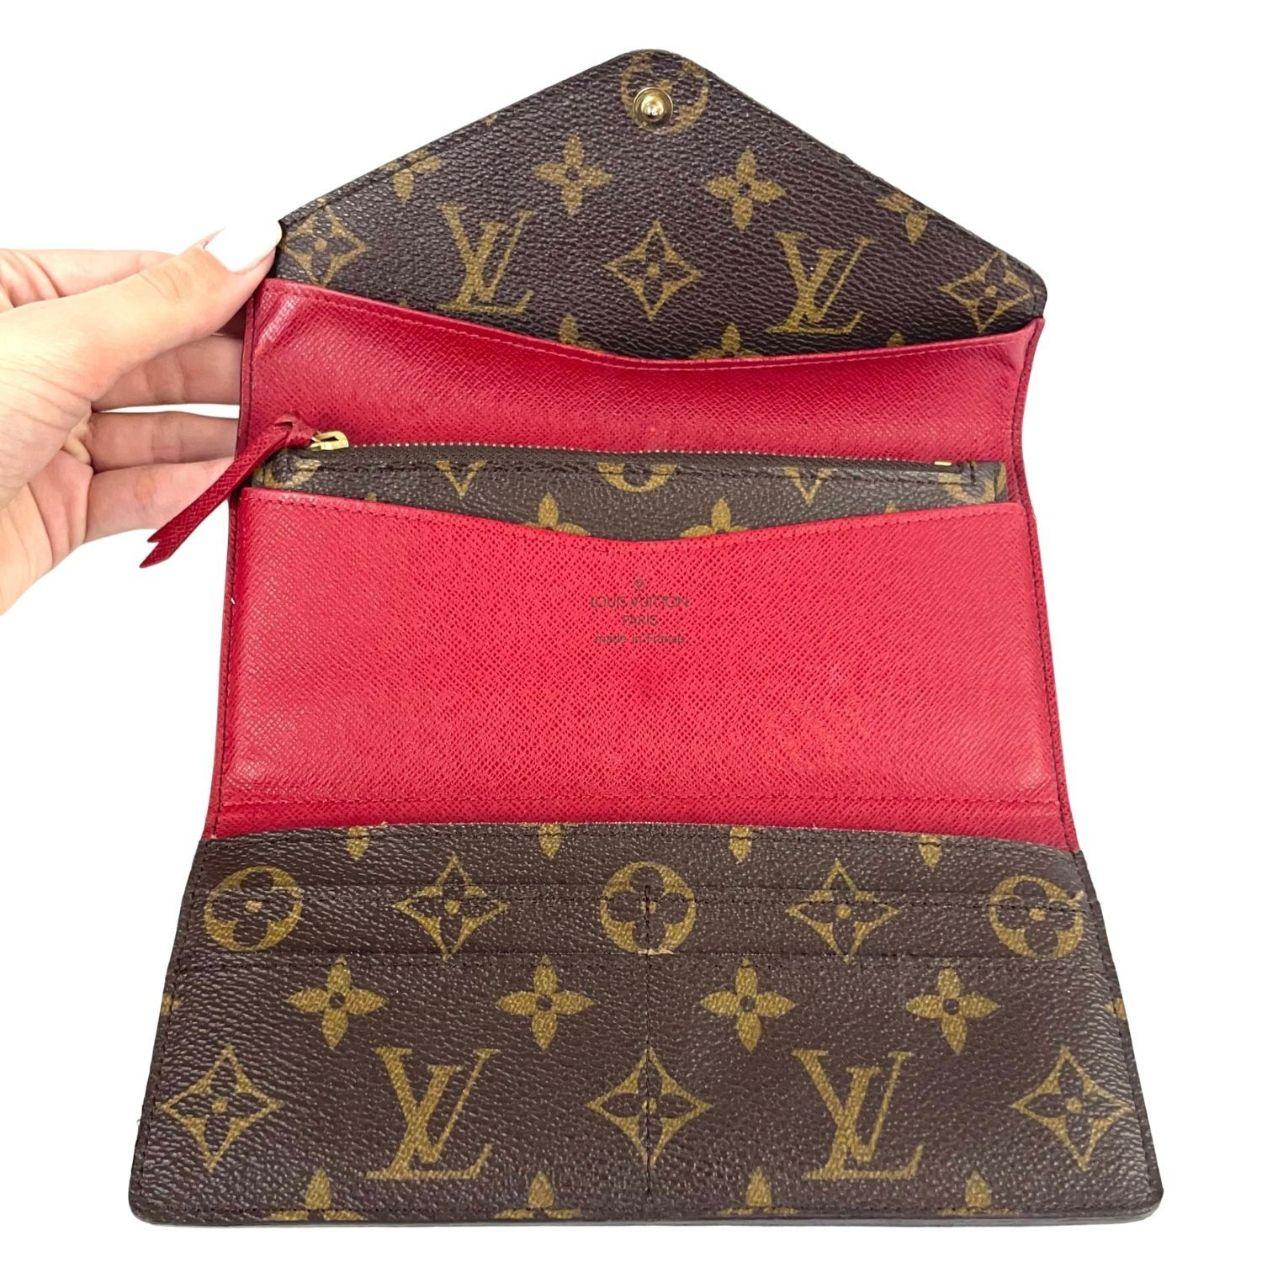 Carteira Louis Vuitton Josephine Monograma